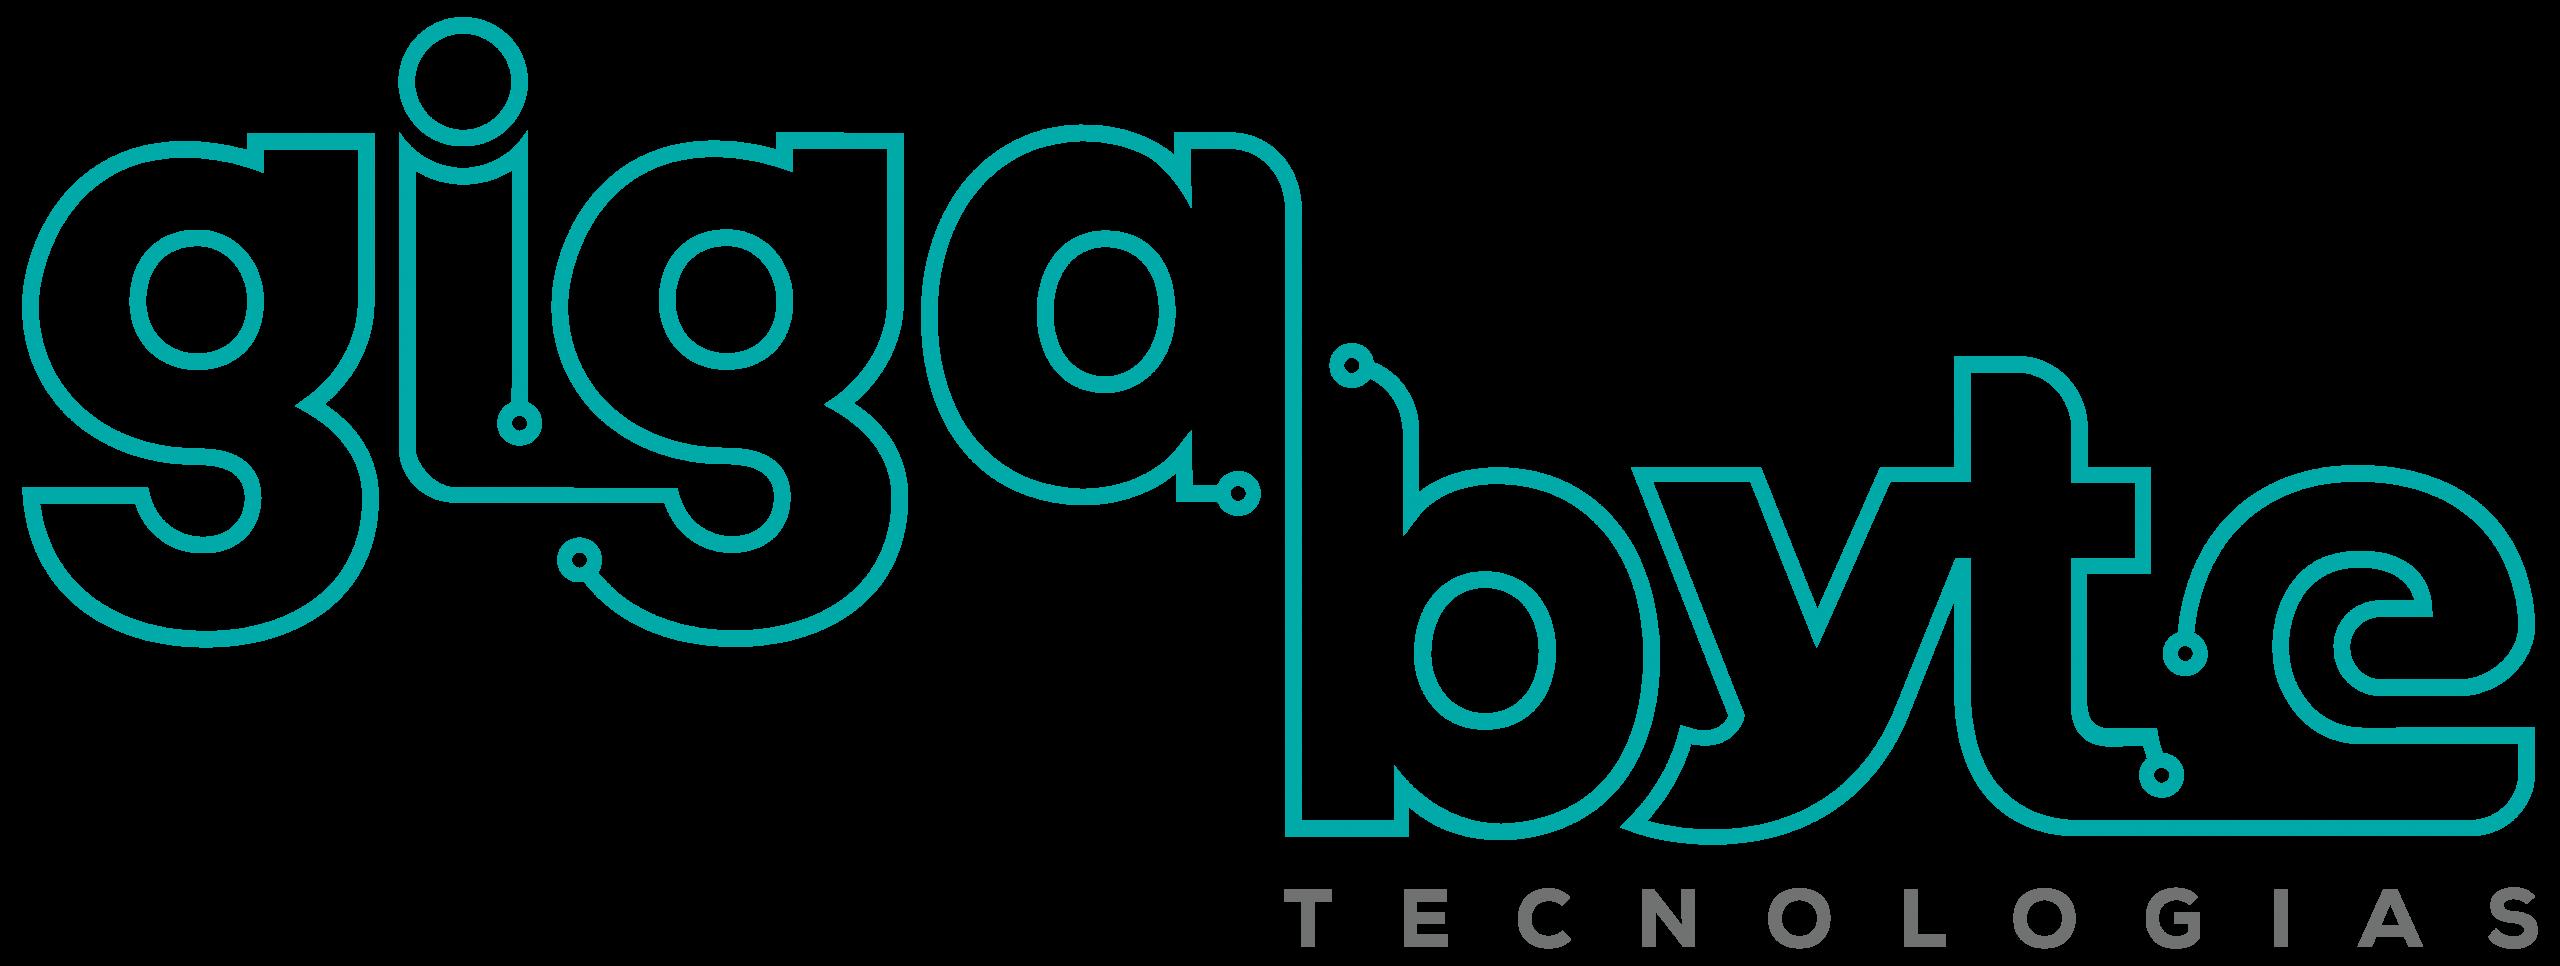 GigaByte Tecnologias